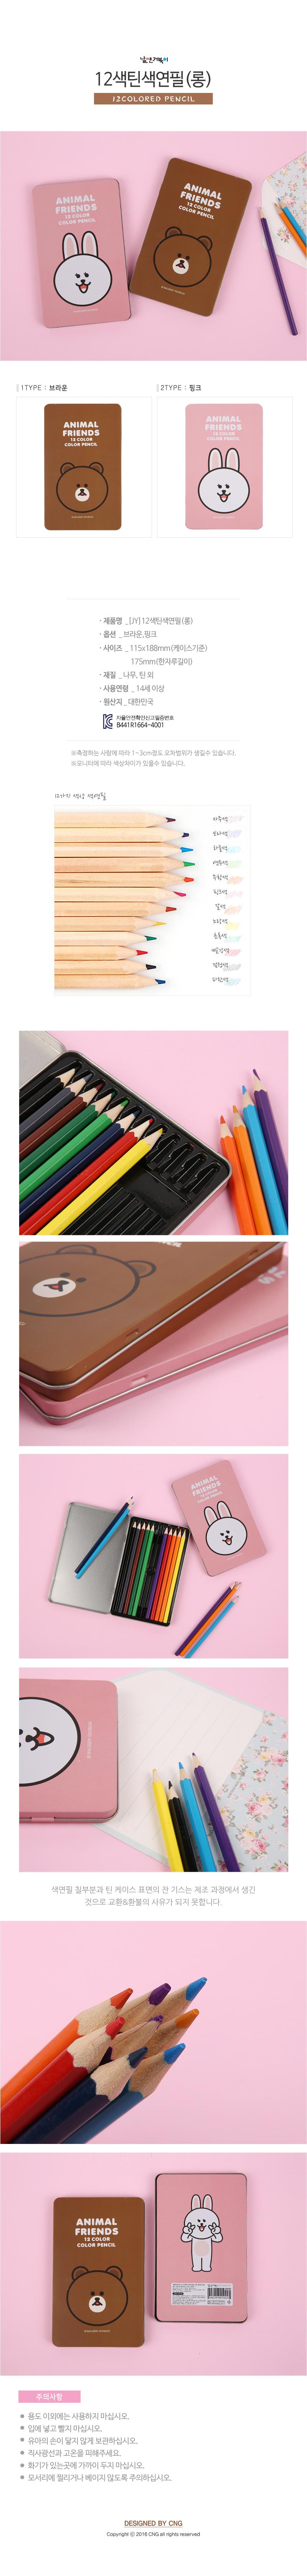 [JY]12색 틴 색연필(롱)4,000원-씨엔지디자인문구, 미술용품, 연필/색연필/크레파스, 색연필바보사랑[JY]12색 틴 색연필(롱)4,000원-씨엔지디자인문구, 미술용품, 연필/색연필/크레파스, 색연필바보사랑